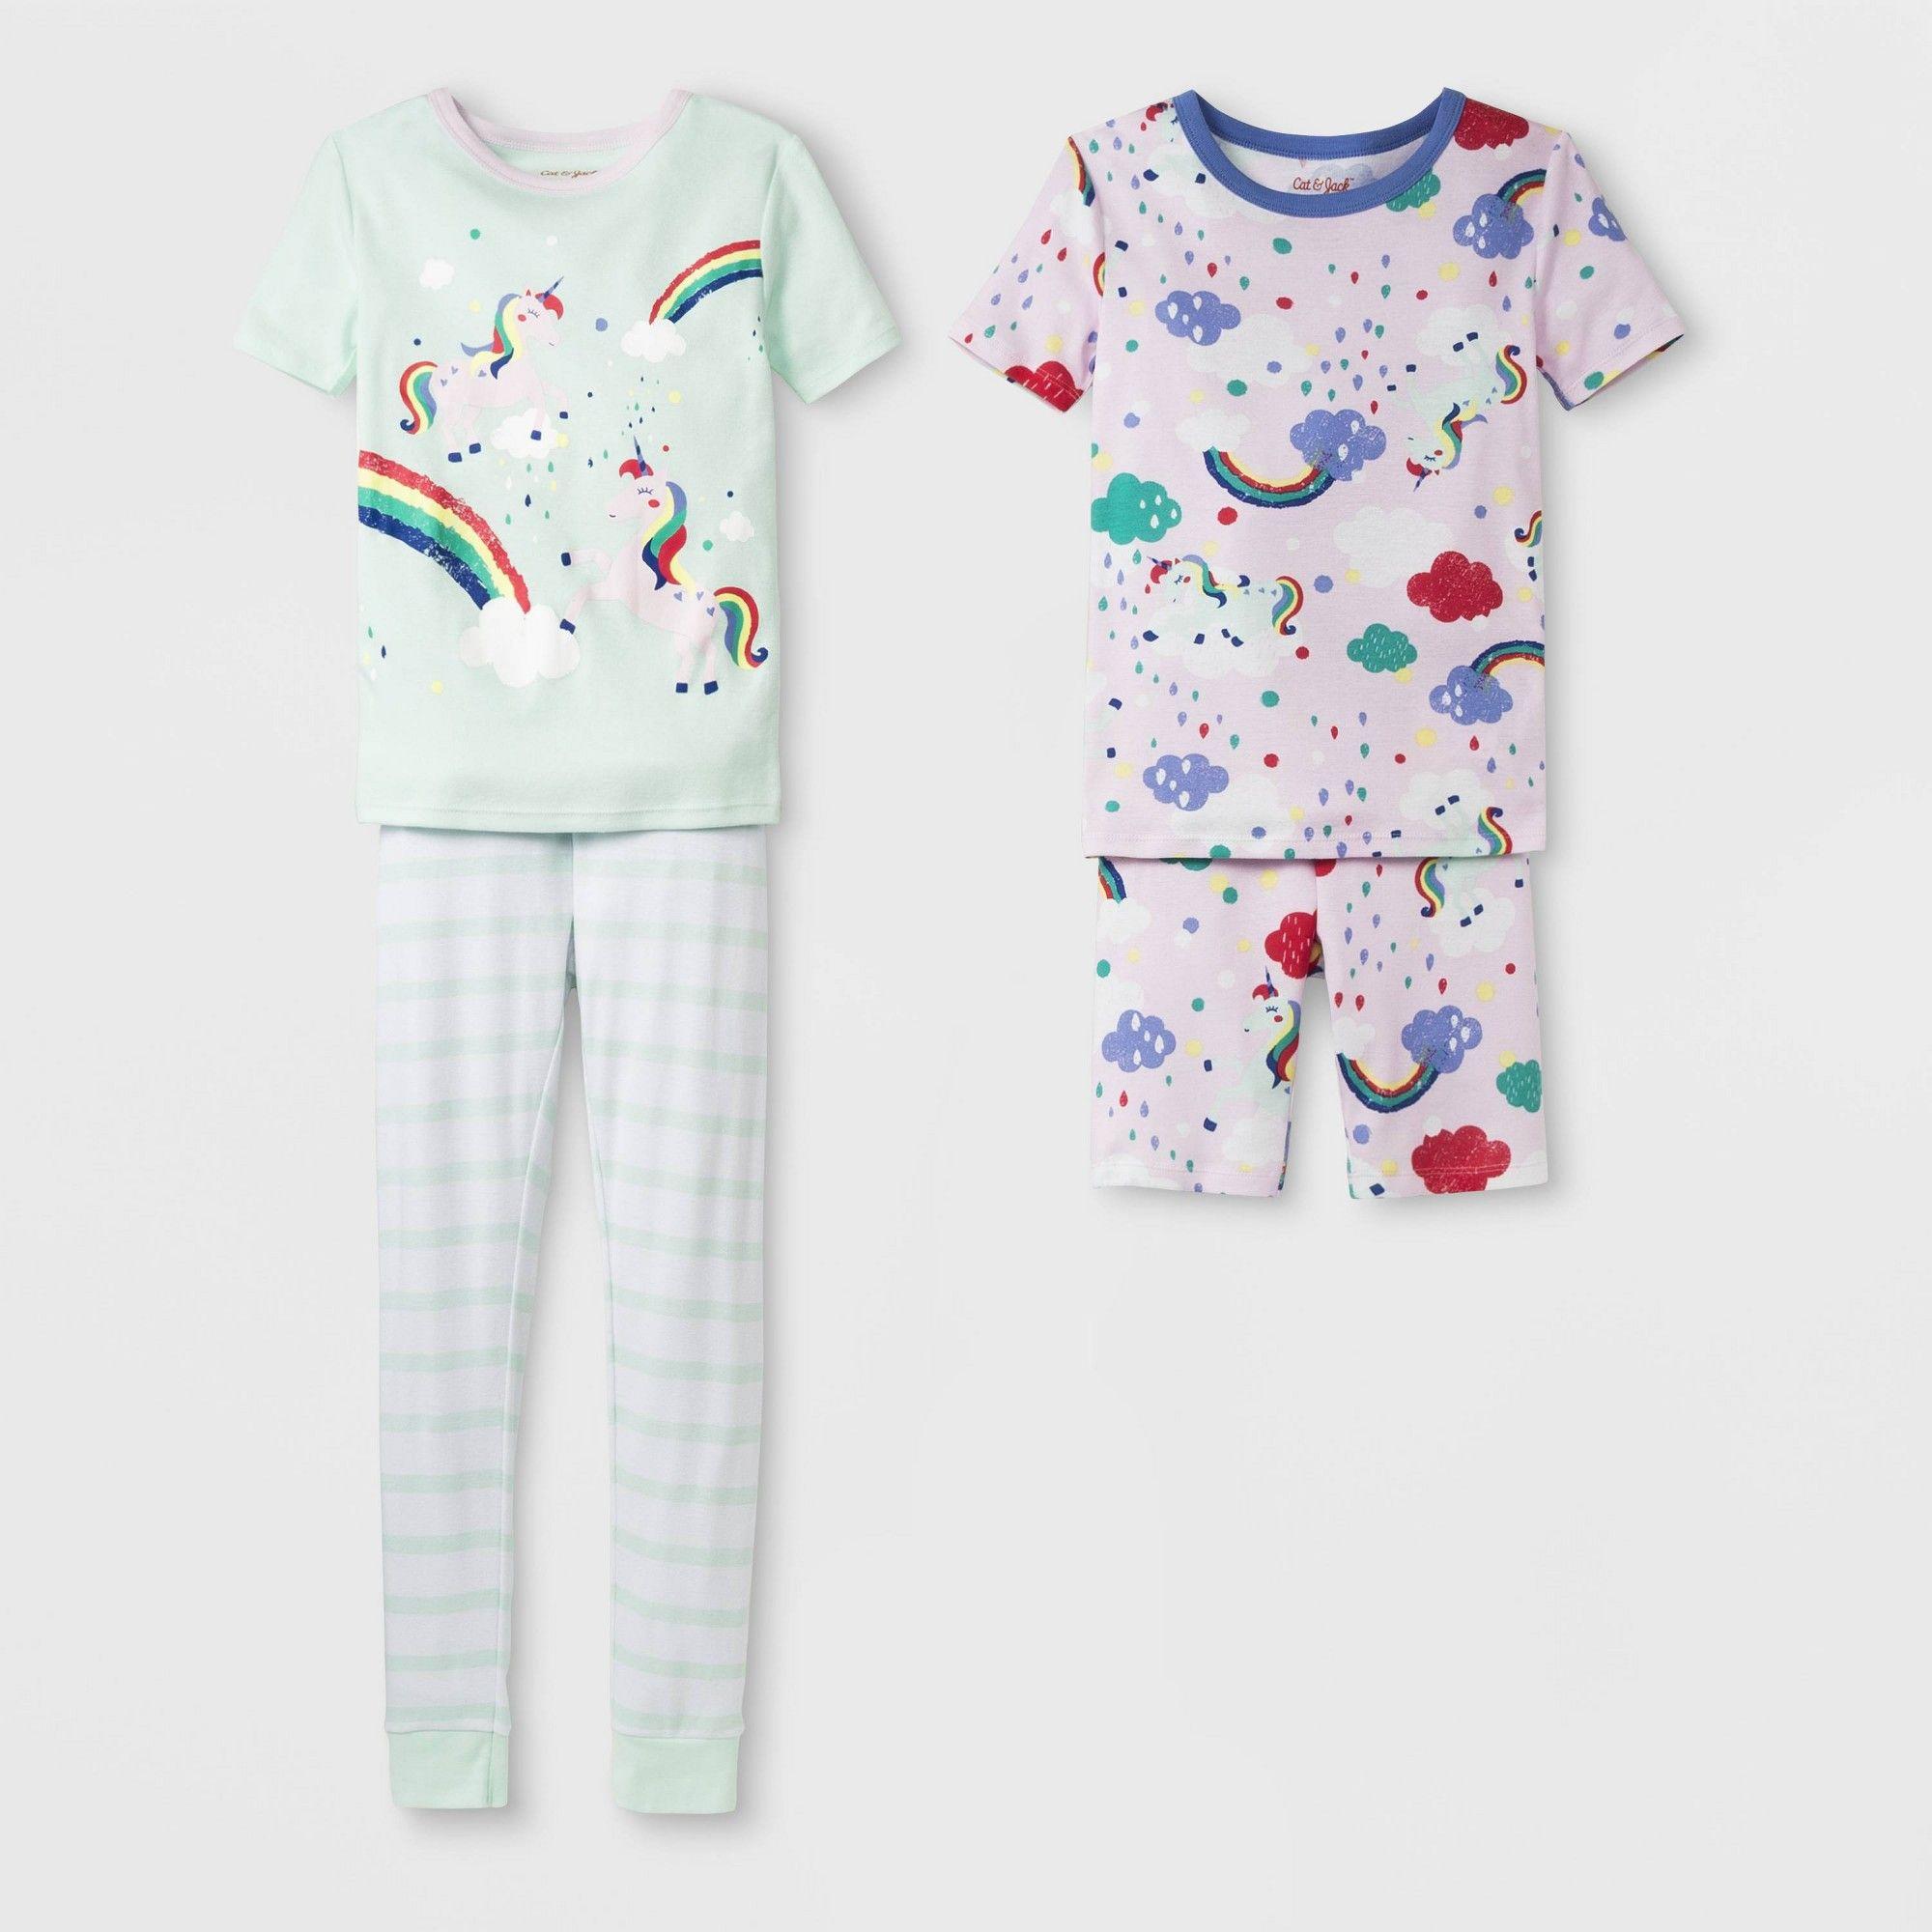 1c66a7d0135 Girls' Tight Fit Rainbow Unicorn Pajama Set - Cat & Jack Moonlight ...